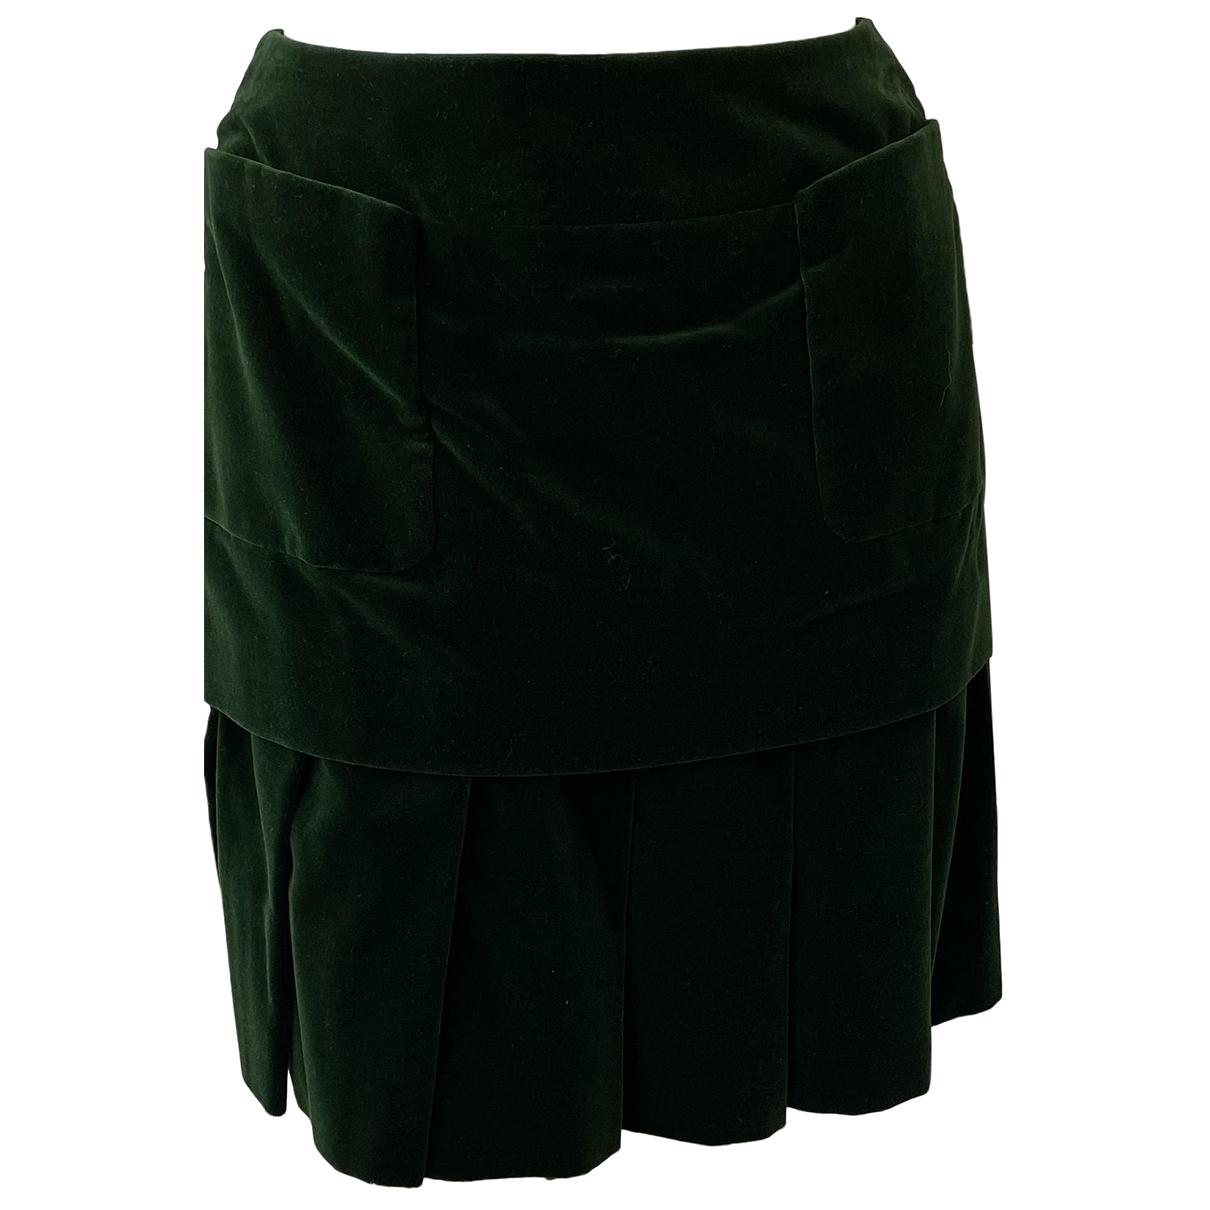 Chanel \N Green Cotton skirt for Women 38 IT